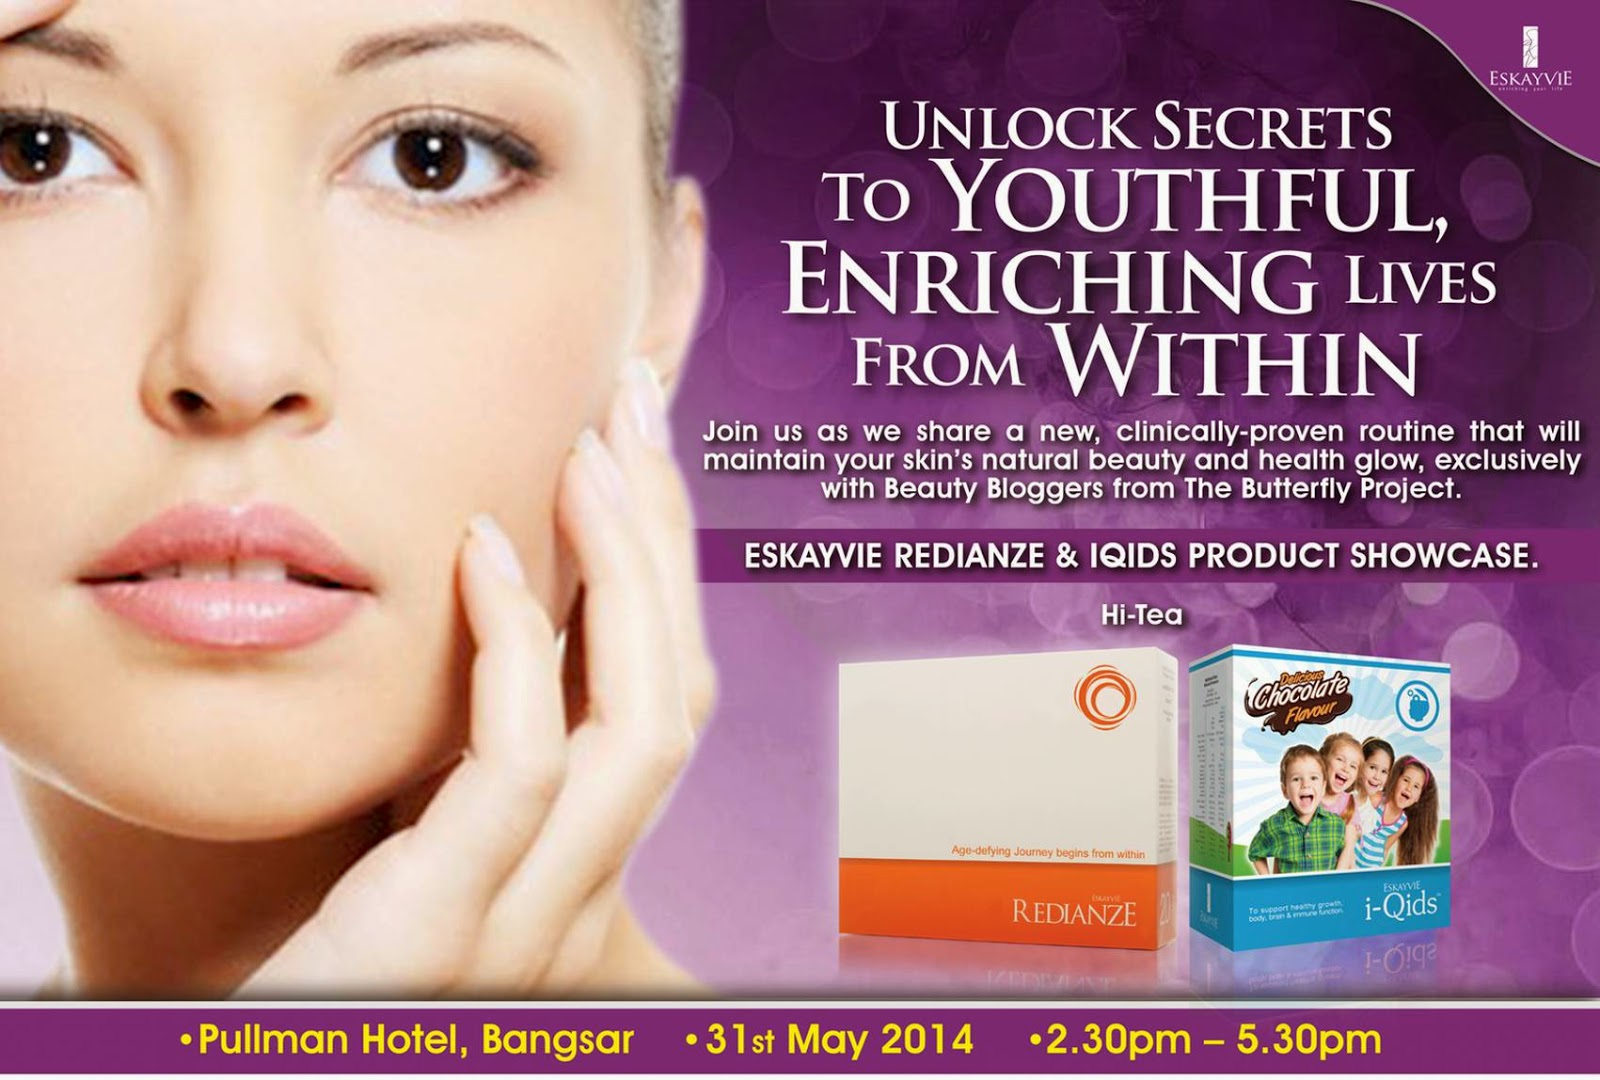 eskayvie_health_beauty_supplements_antiaging